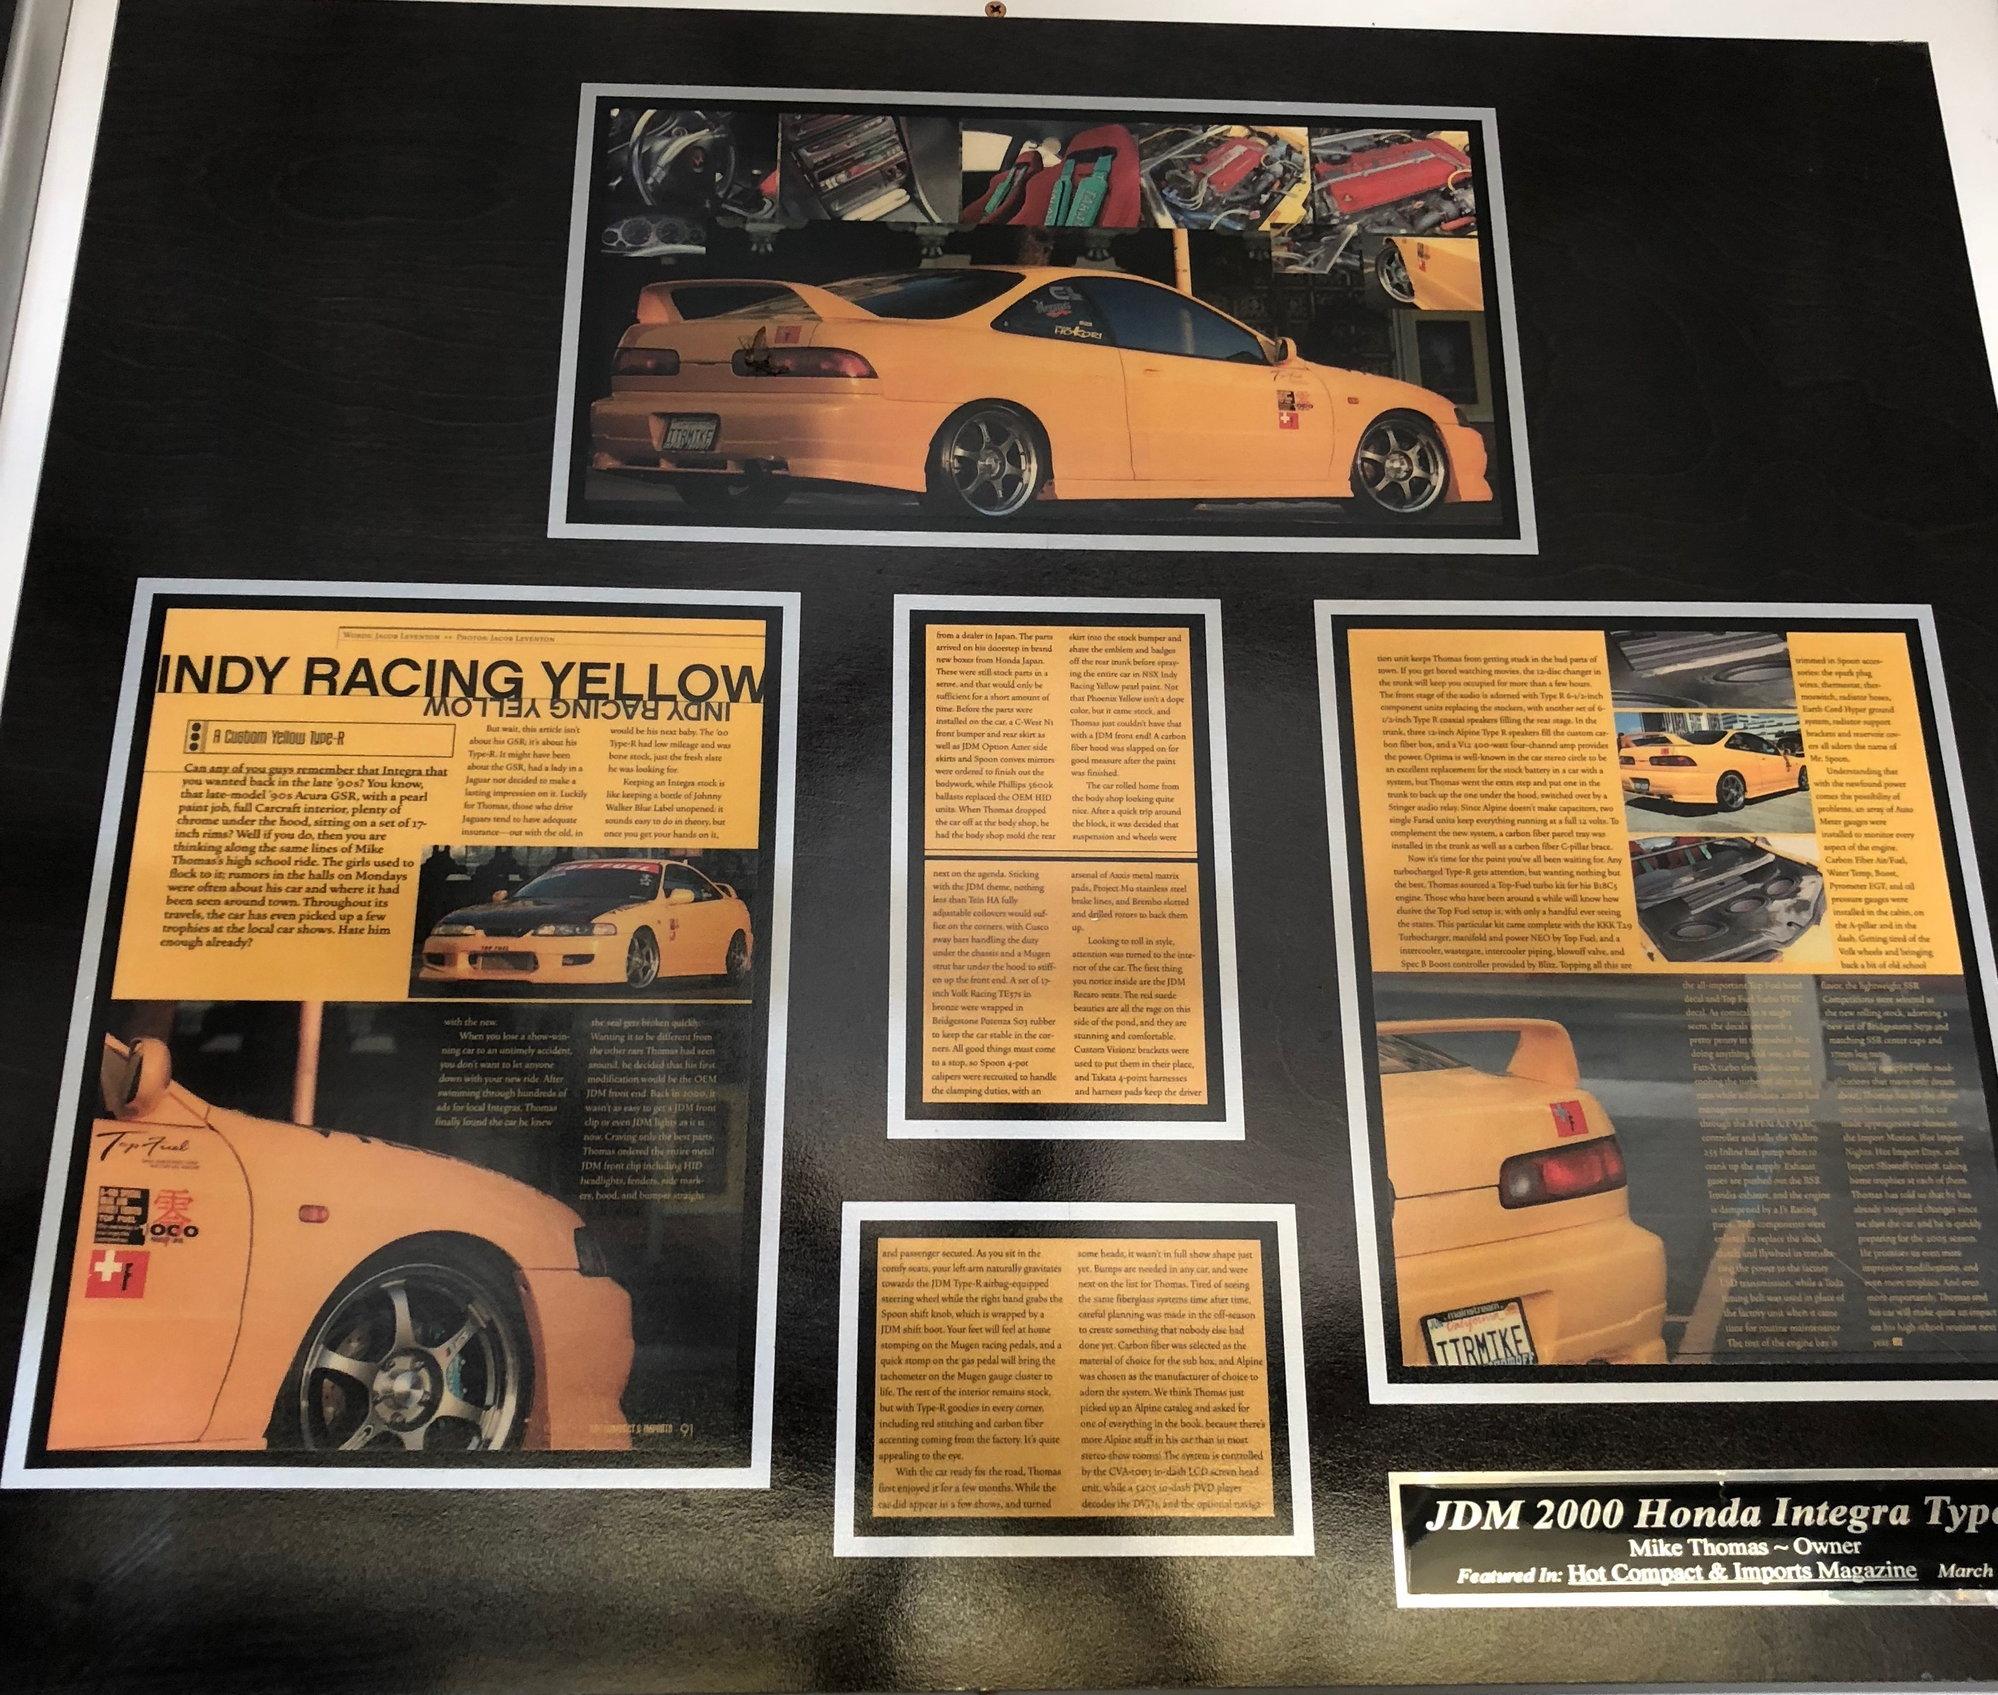 CA FS 2000 Acura Integra Type R